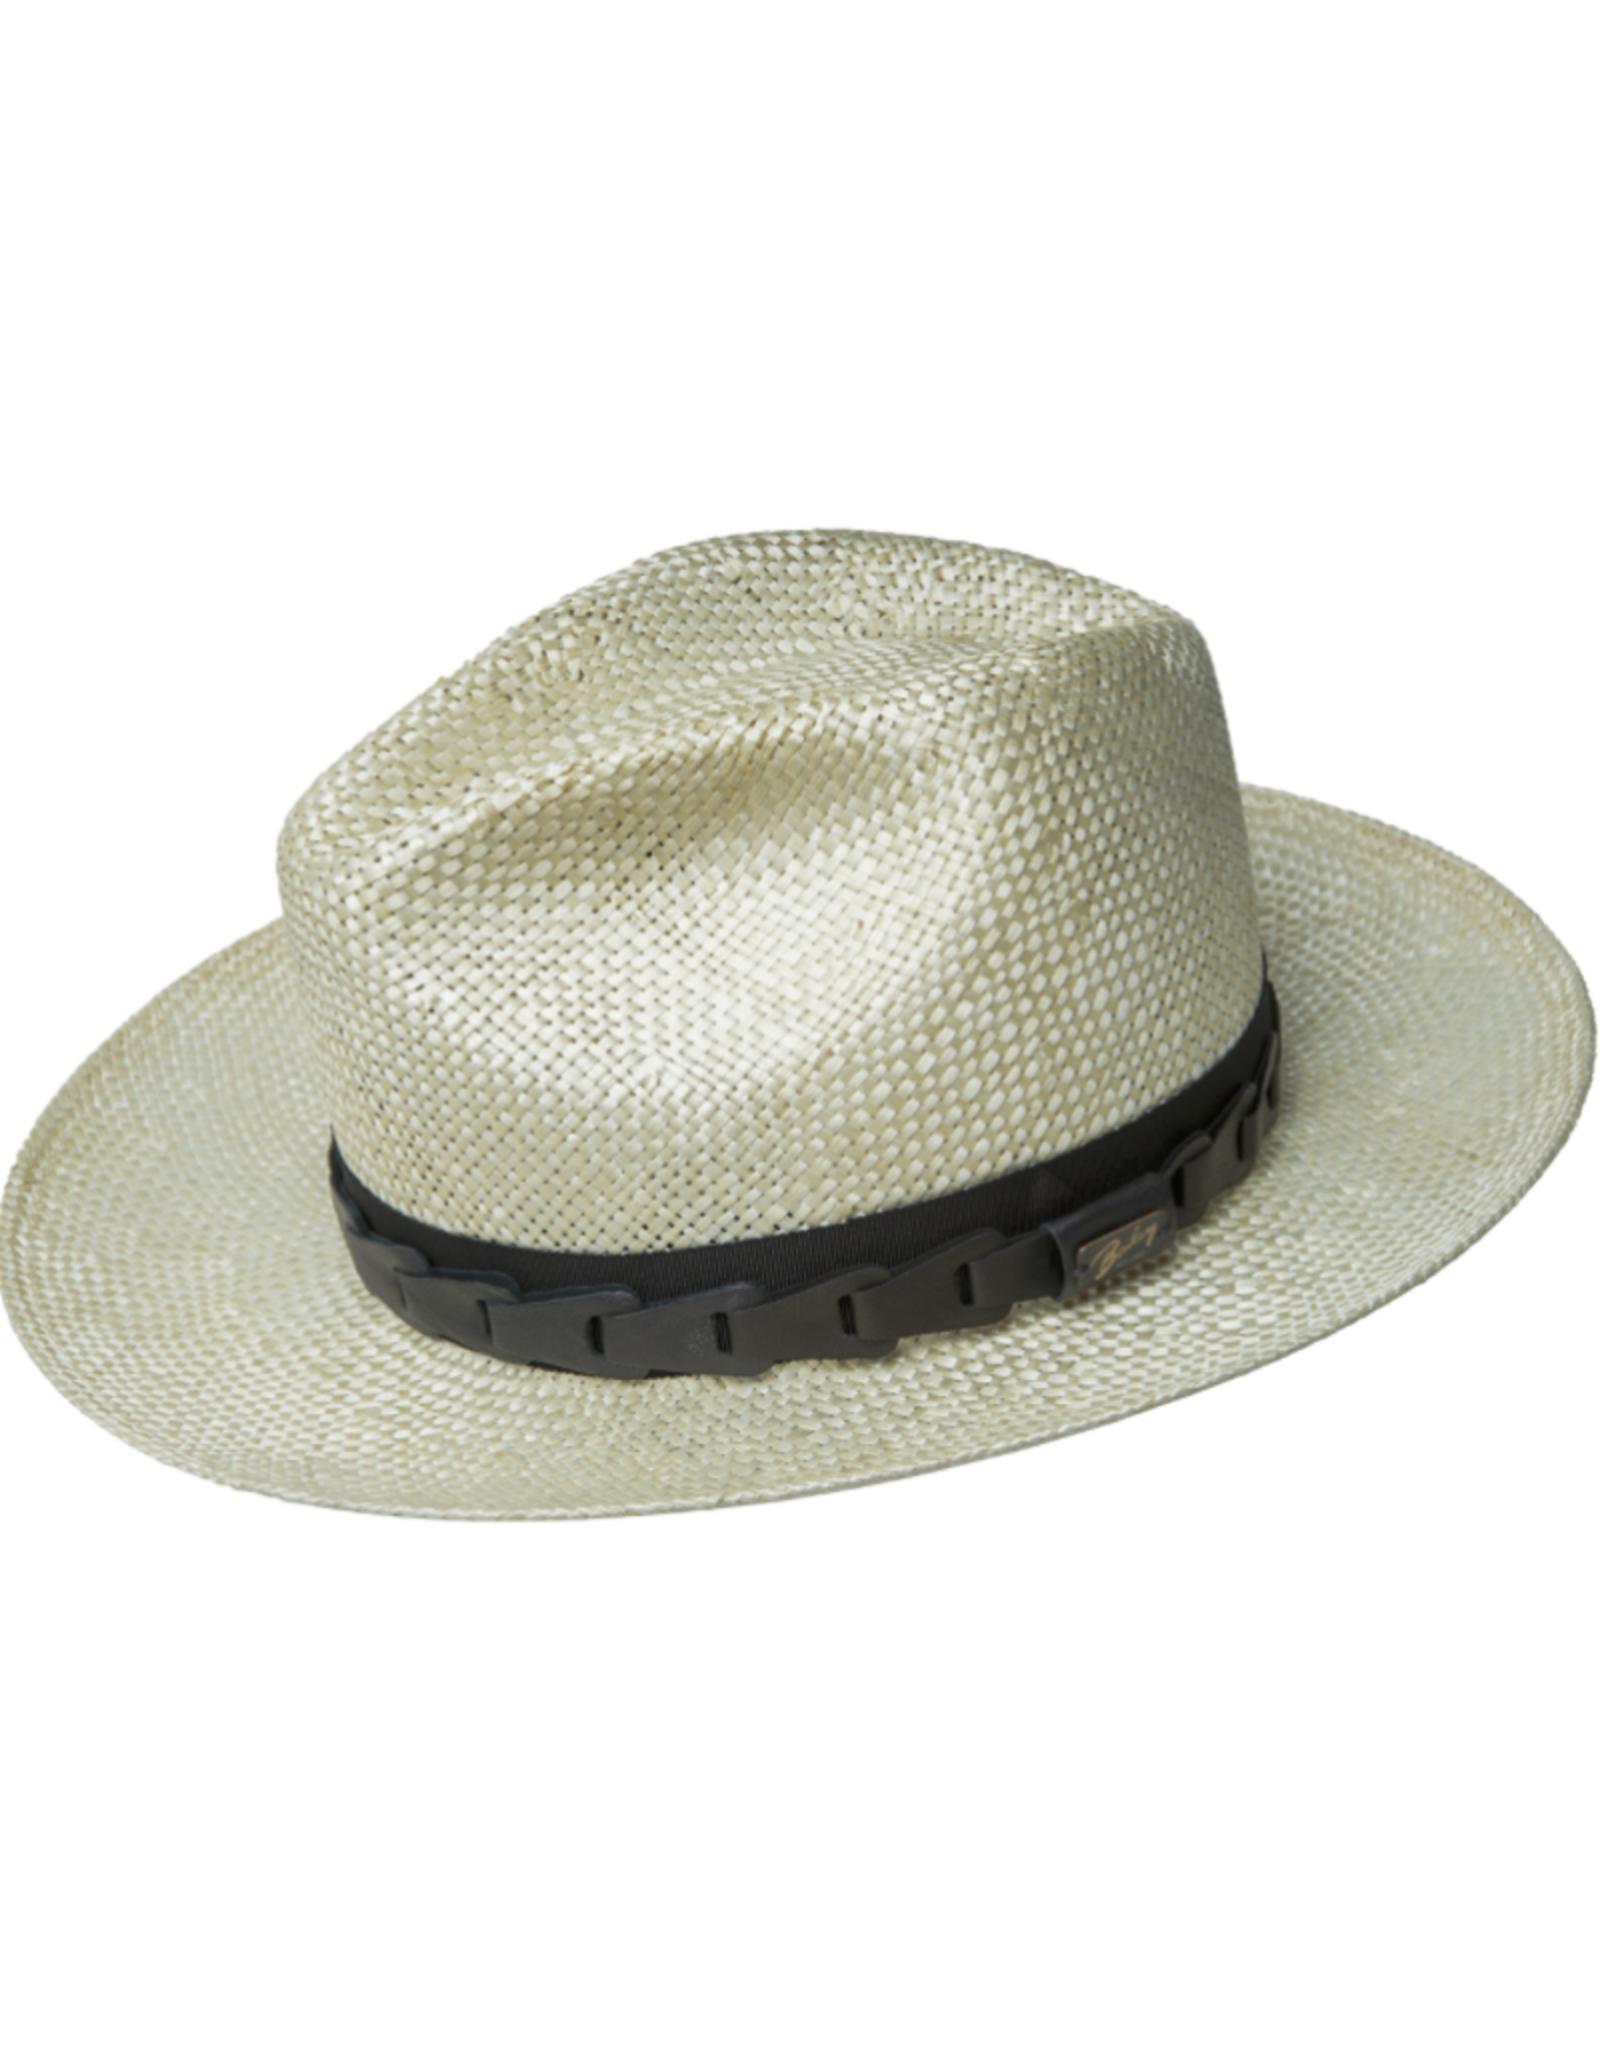 "Bailey Hat Co. HAT-FEDORA  MED BRIM ""RUNDLE"", STRAW"